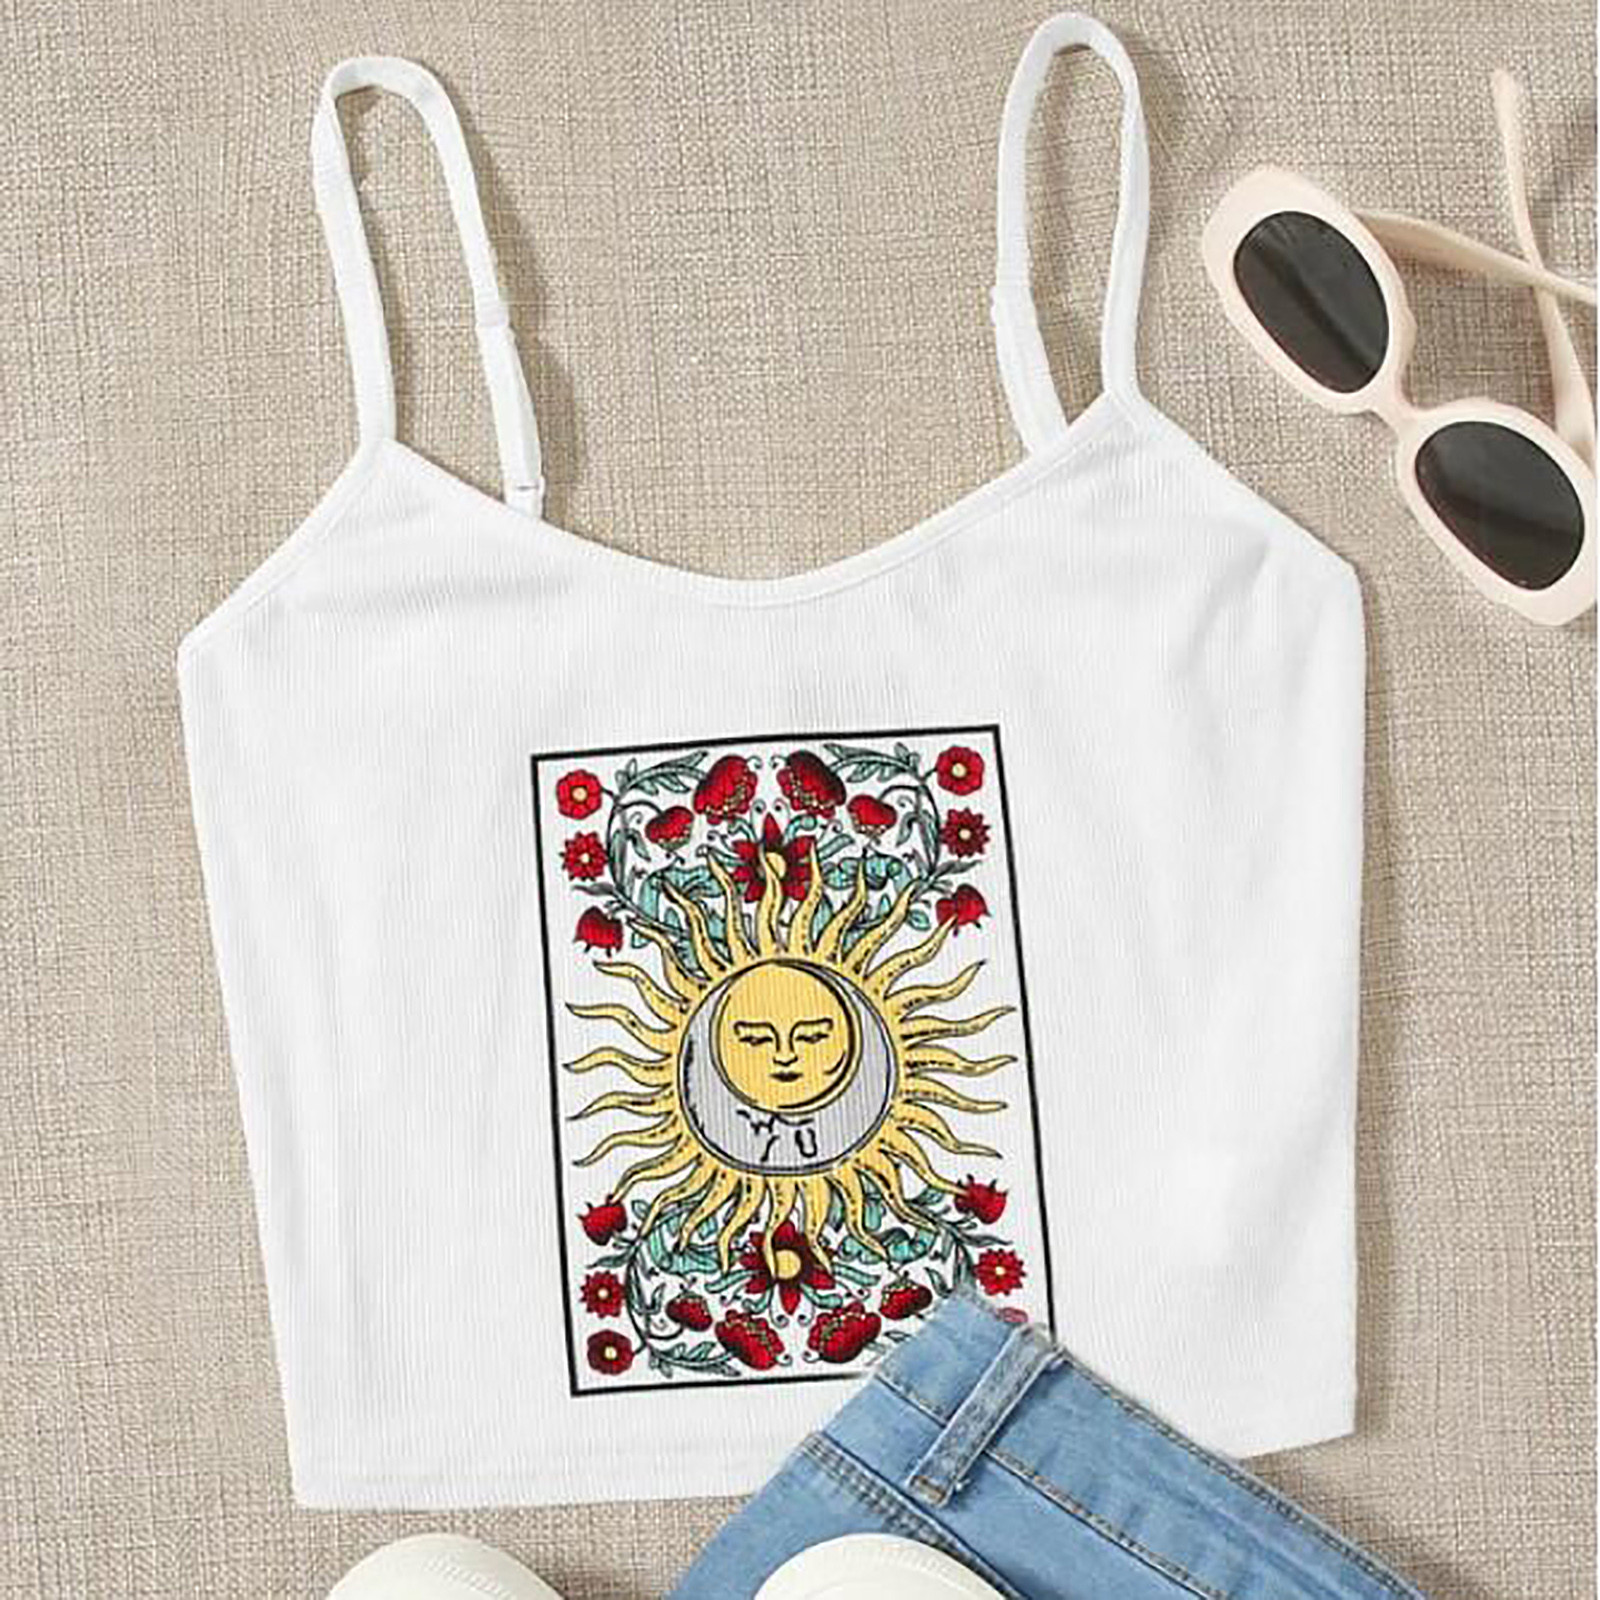 T-Shirt Rose-Tops Blouse Sling-Vest Camisetas-De-Mujer Retro Fashion Women's Slim-Fit